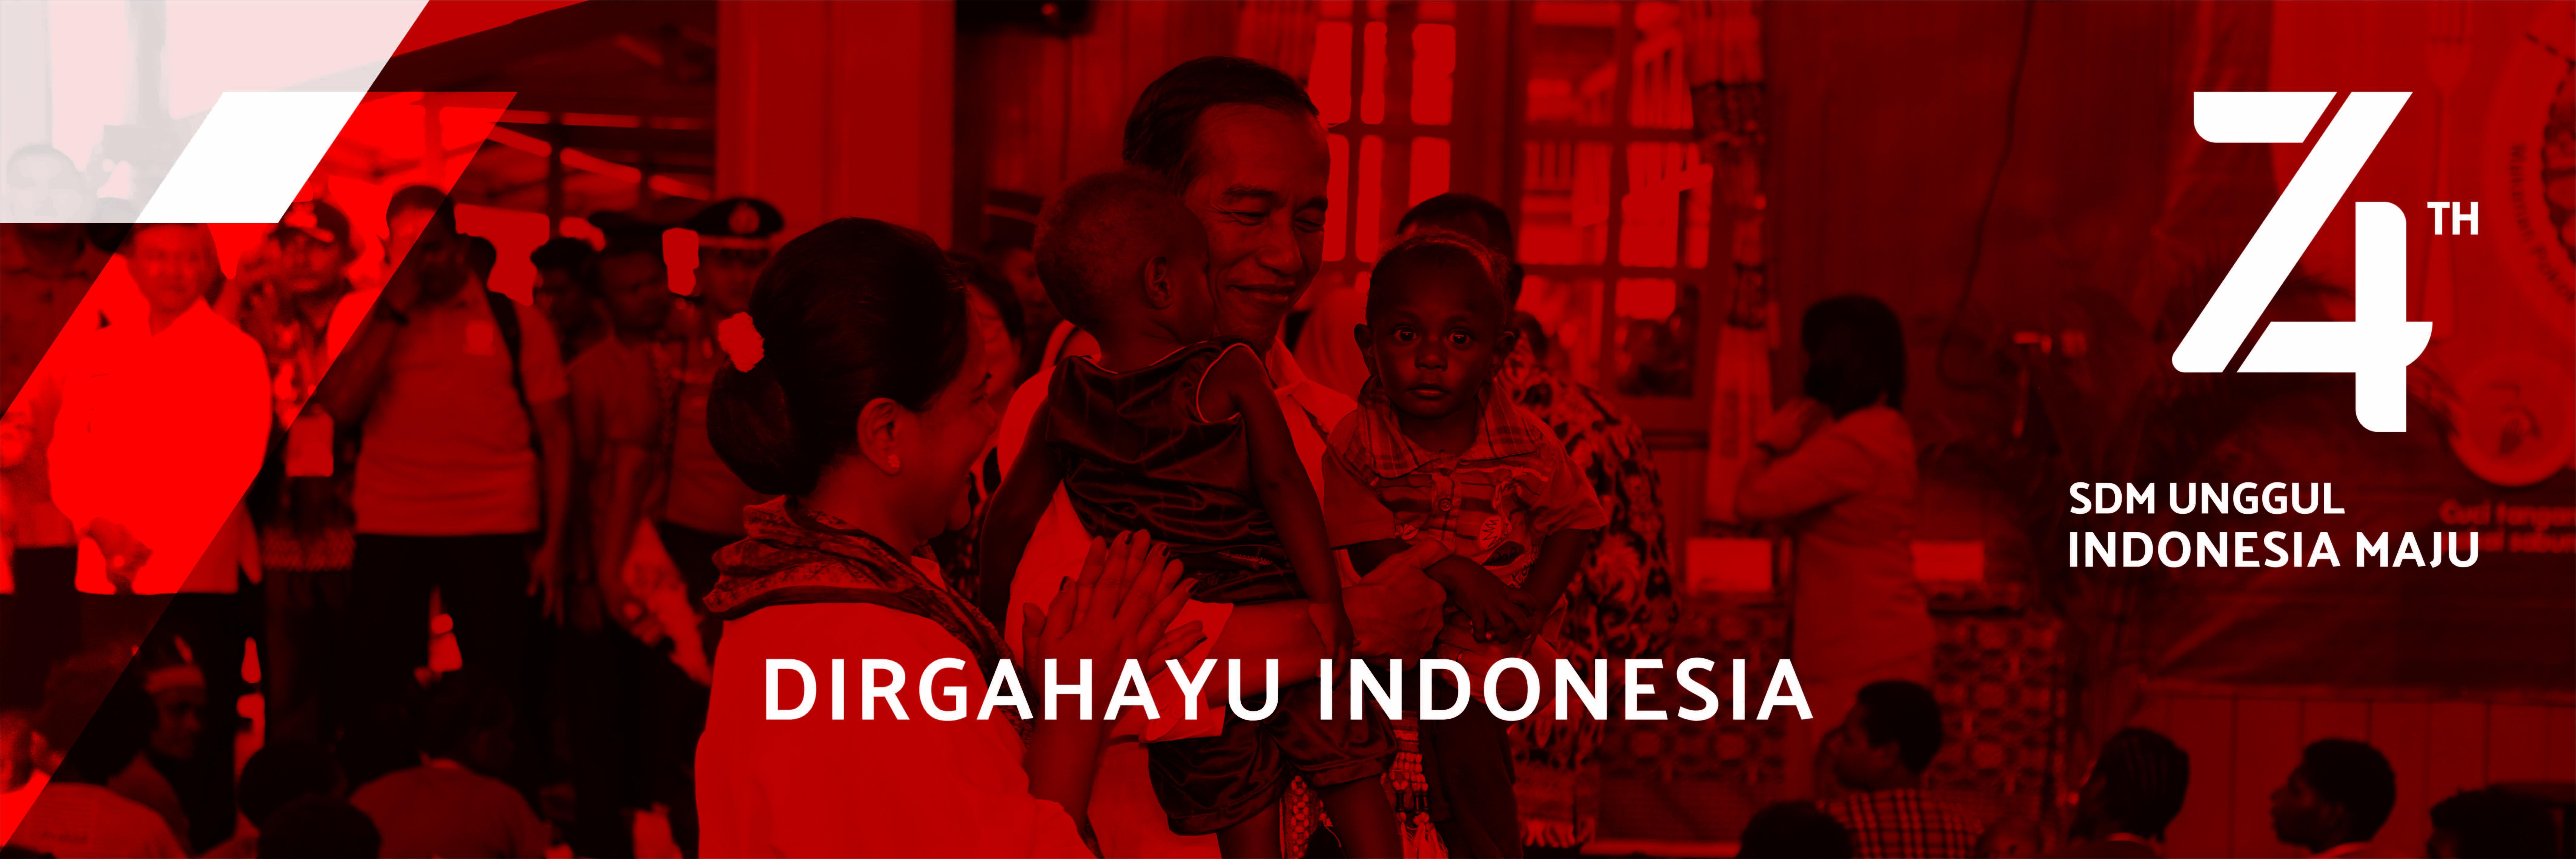 DIRGAHAYU INDONESIA<BR>-MENUJU INDONESIA UNGGUL-